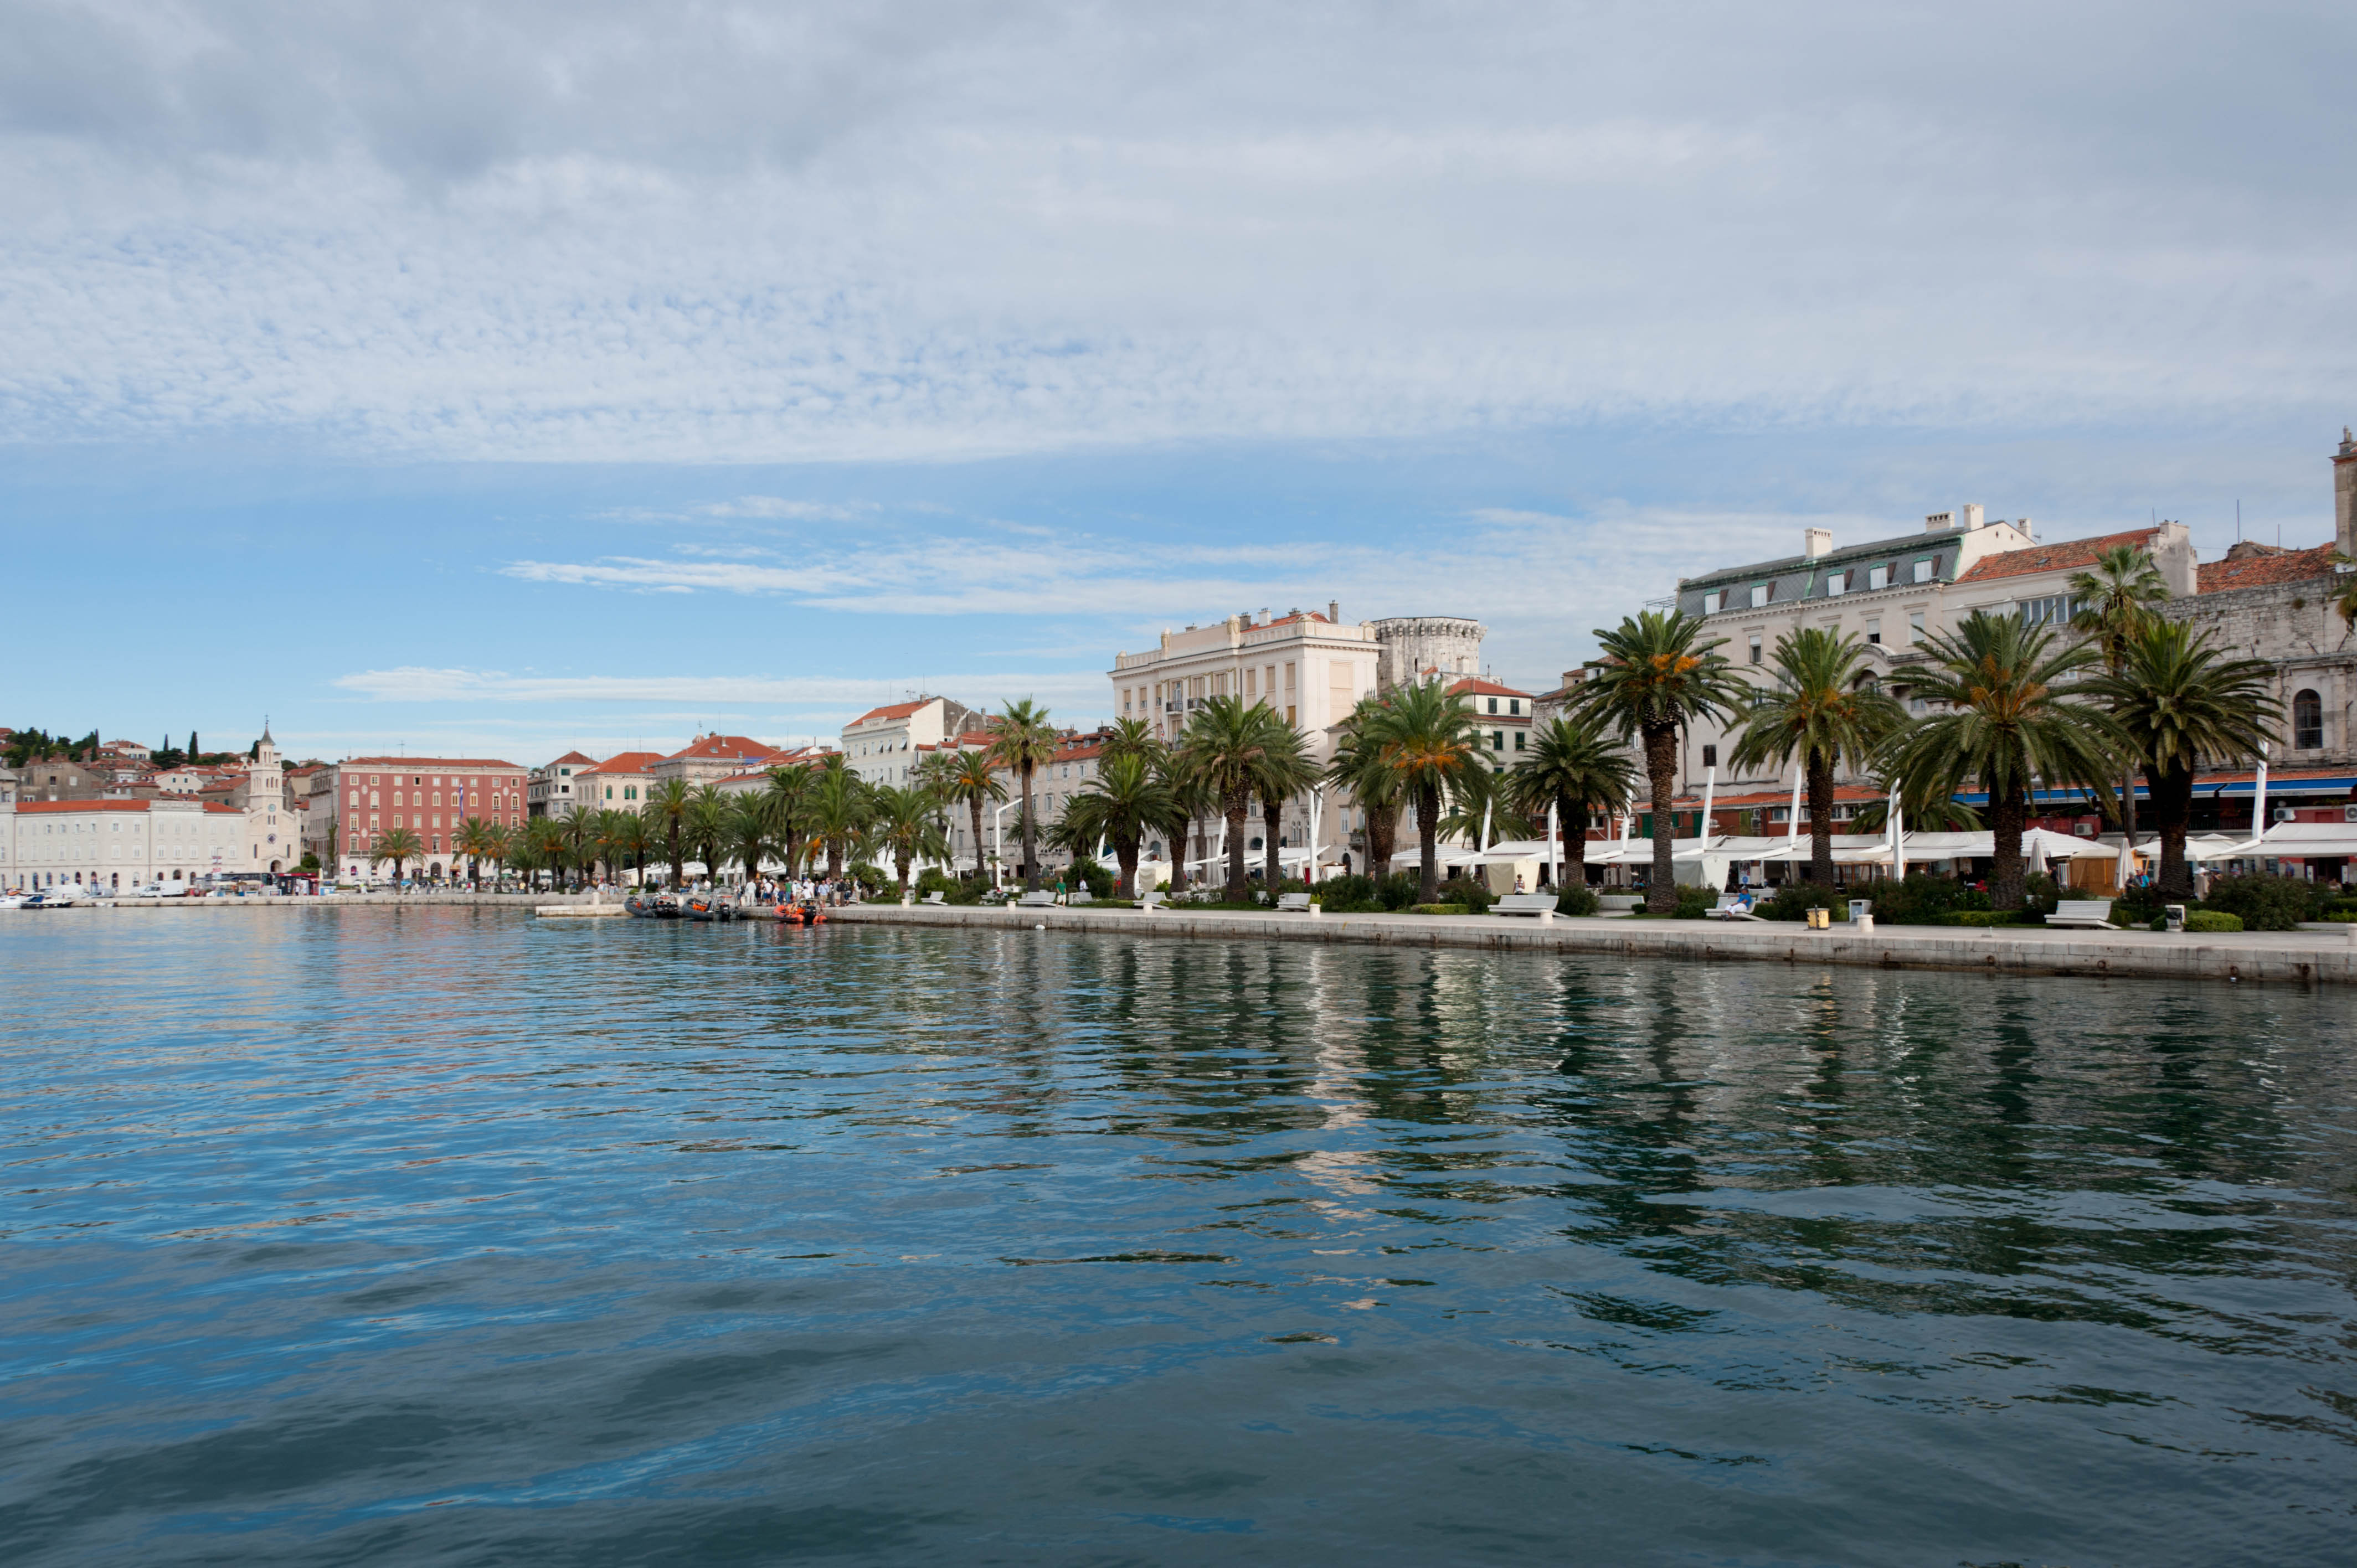 9806-Split (Dalmatie centrale)